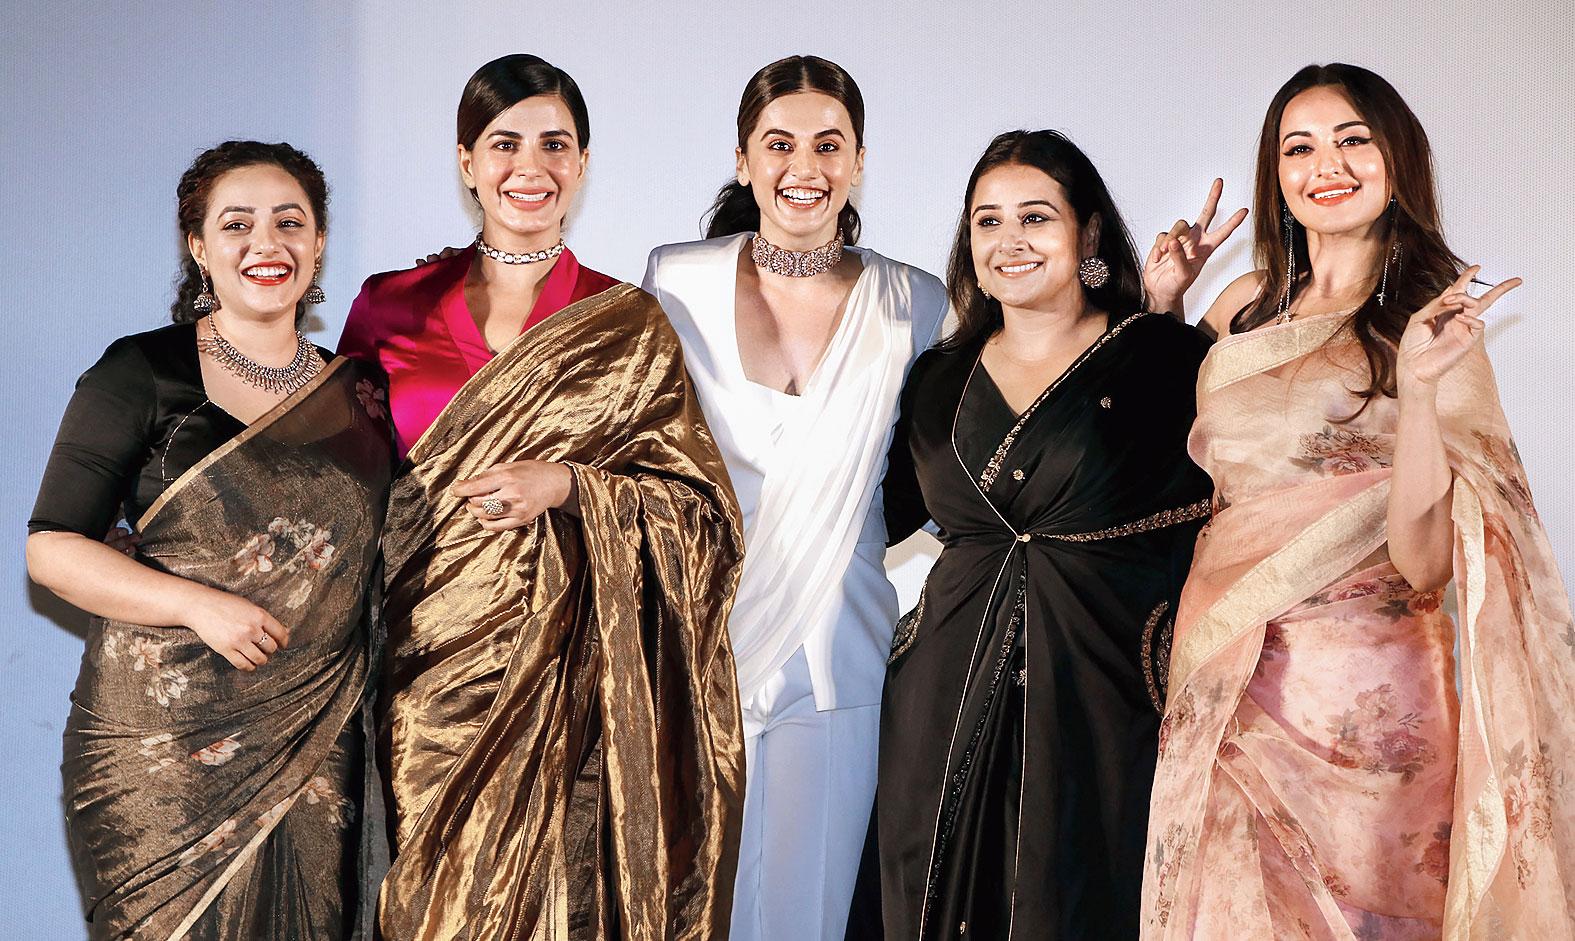 Sonakshi with Vidya Balan, Taapsee Pannu, Kirti Kulhari and Nithya Menen at the trailer launch of Mission Mangal